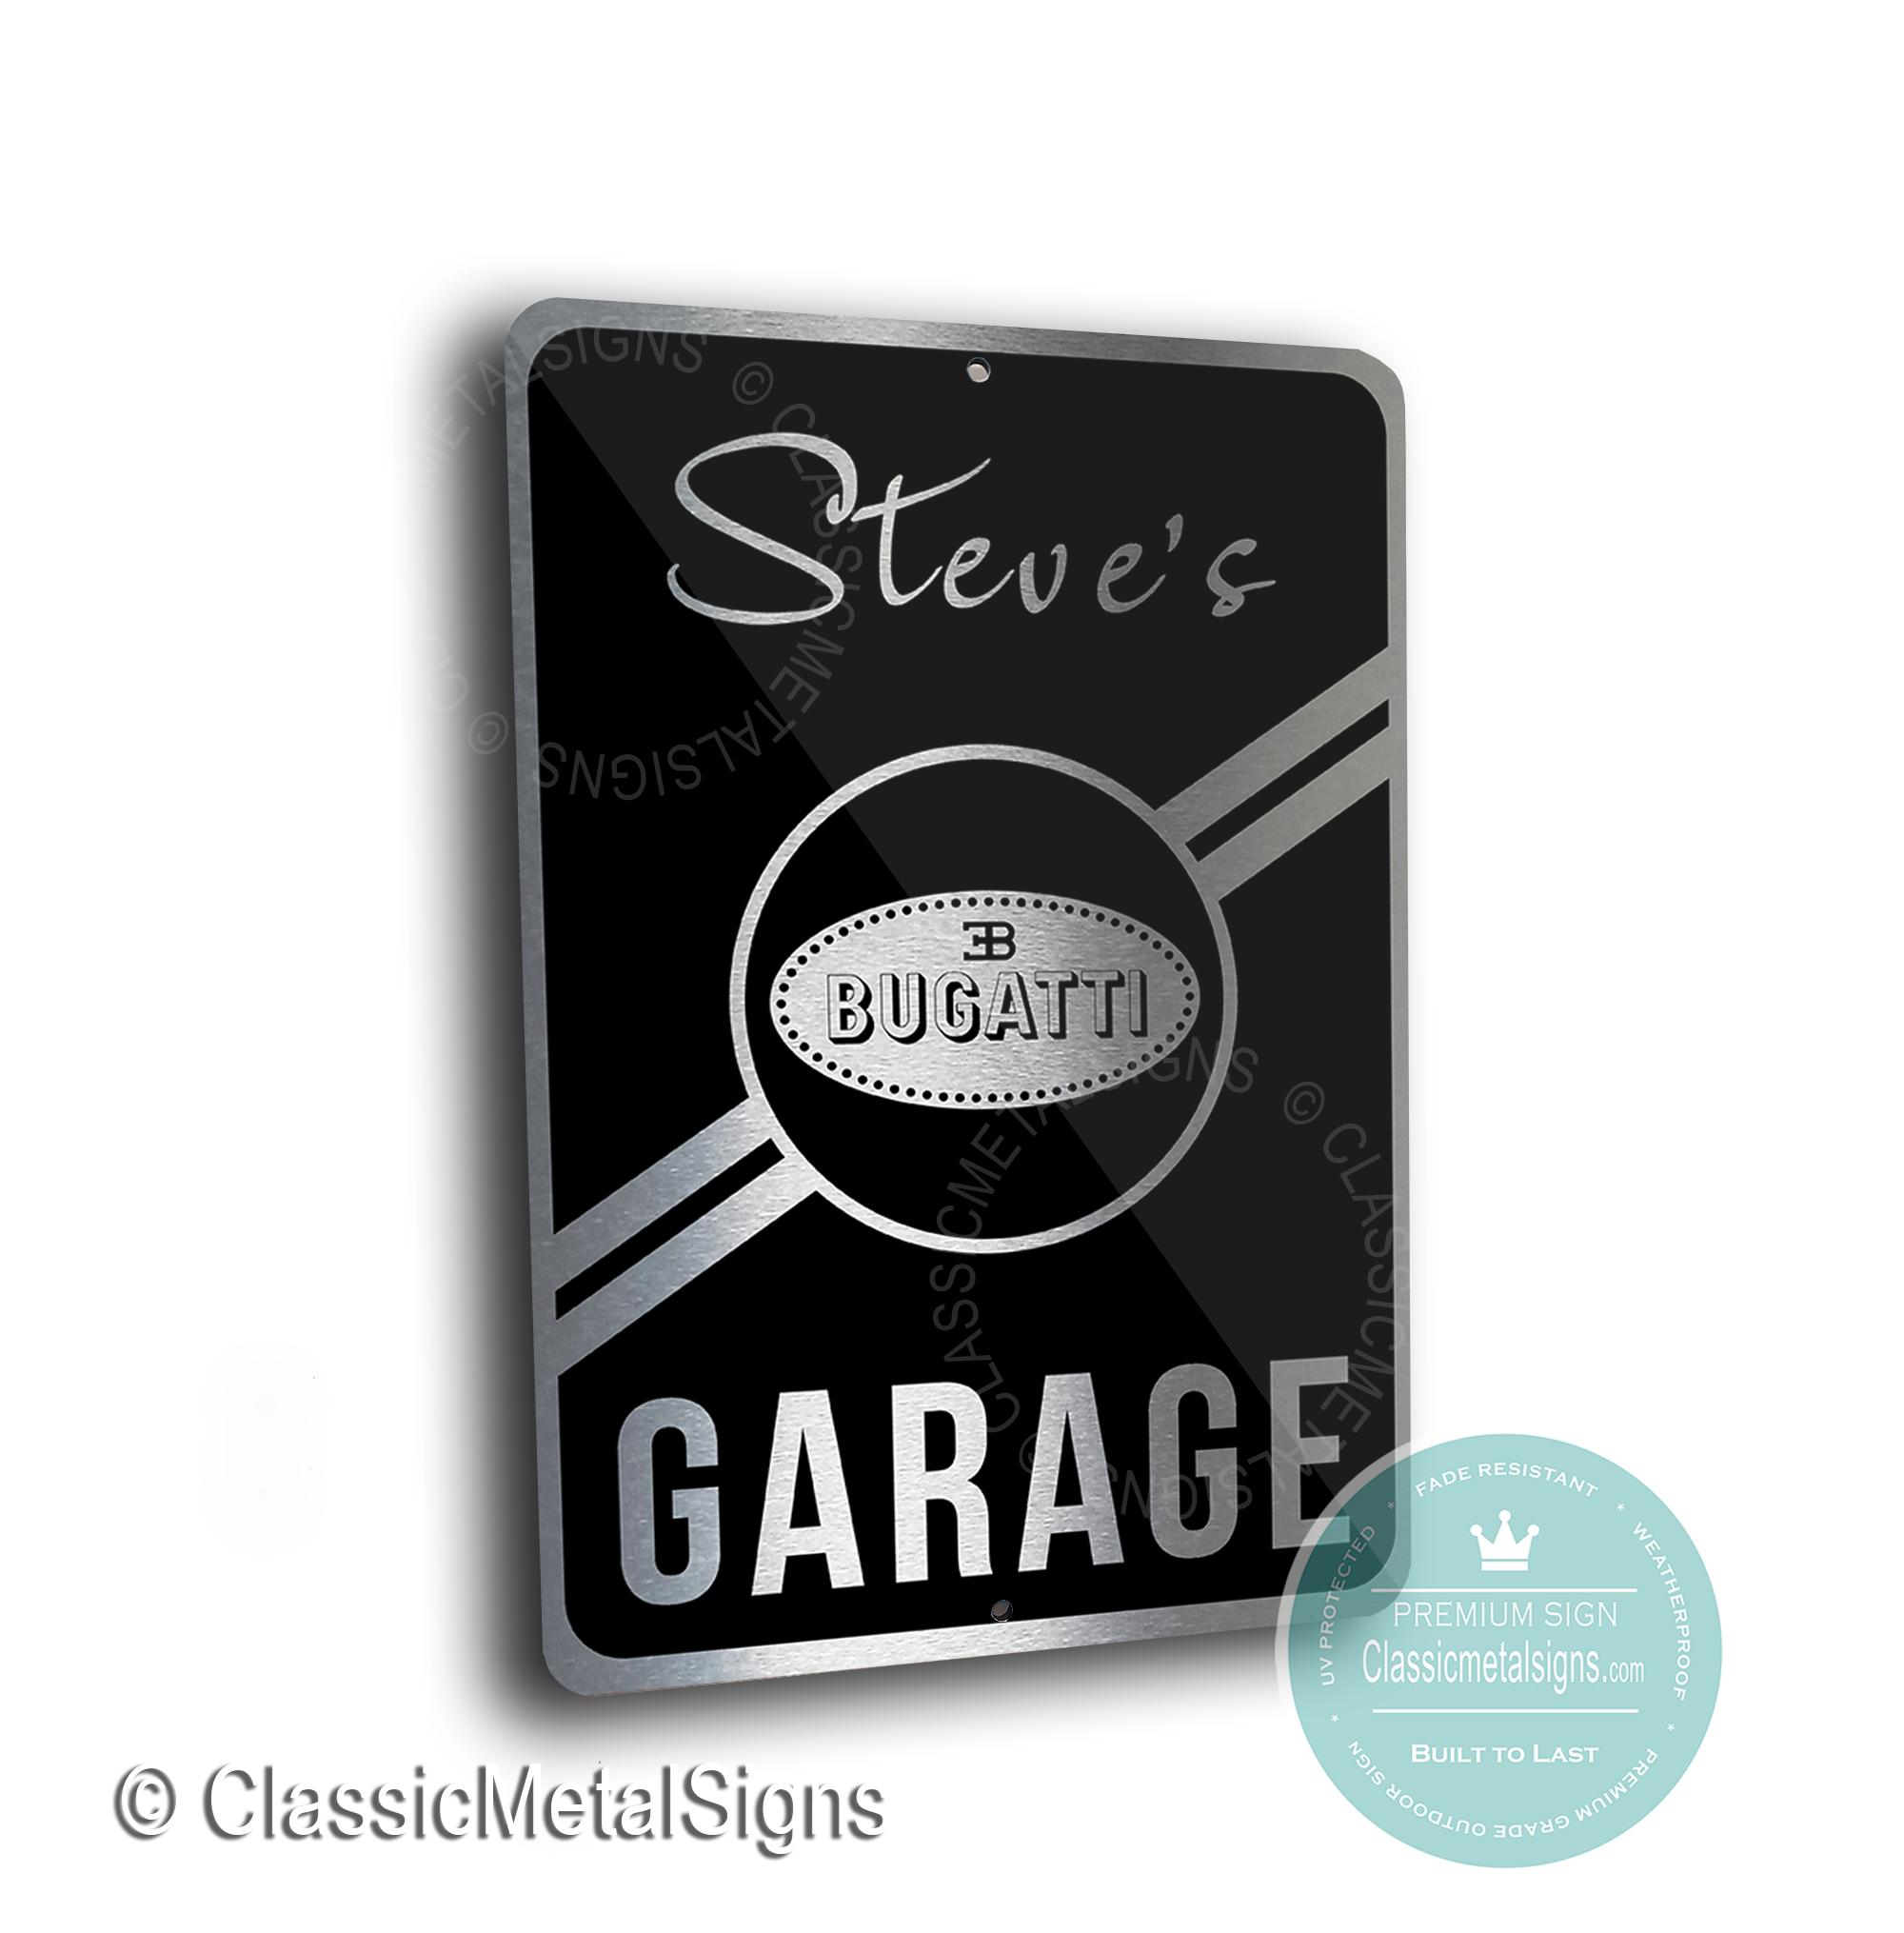 Bugatti Garage Signs